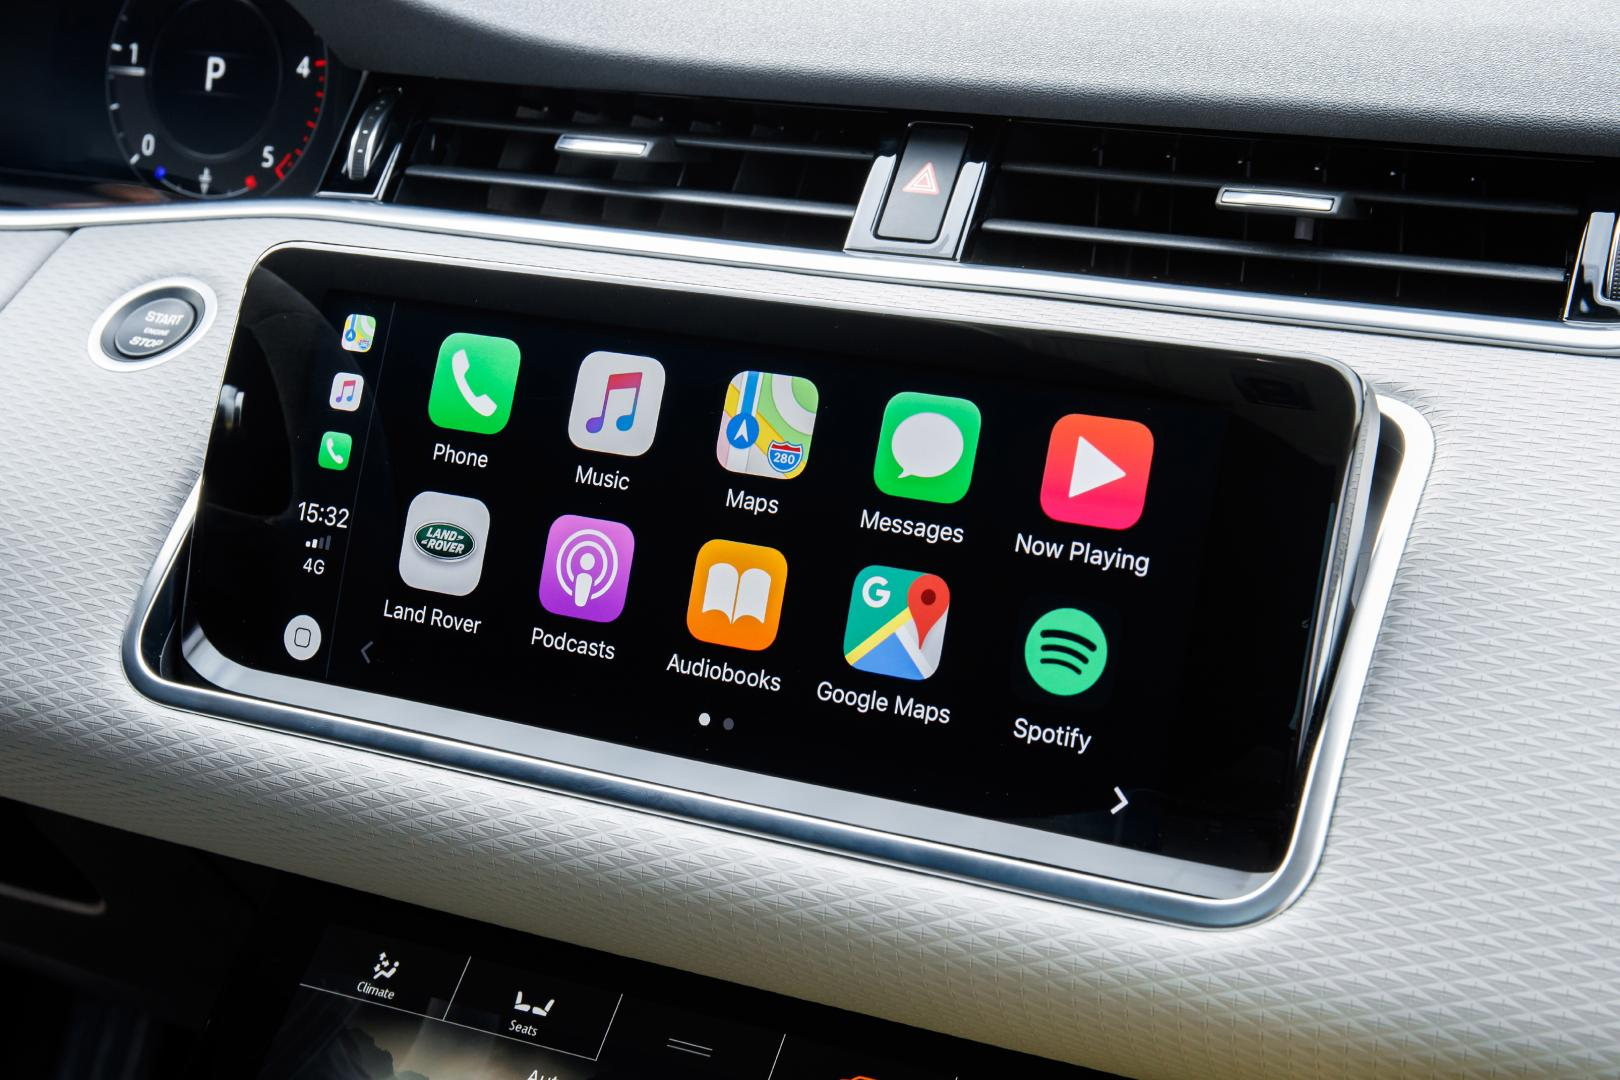 Range Rover Evoque Carplay navigatie apple